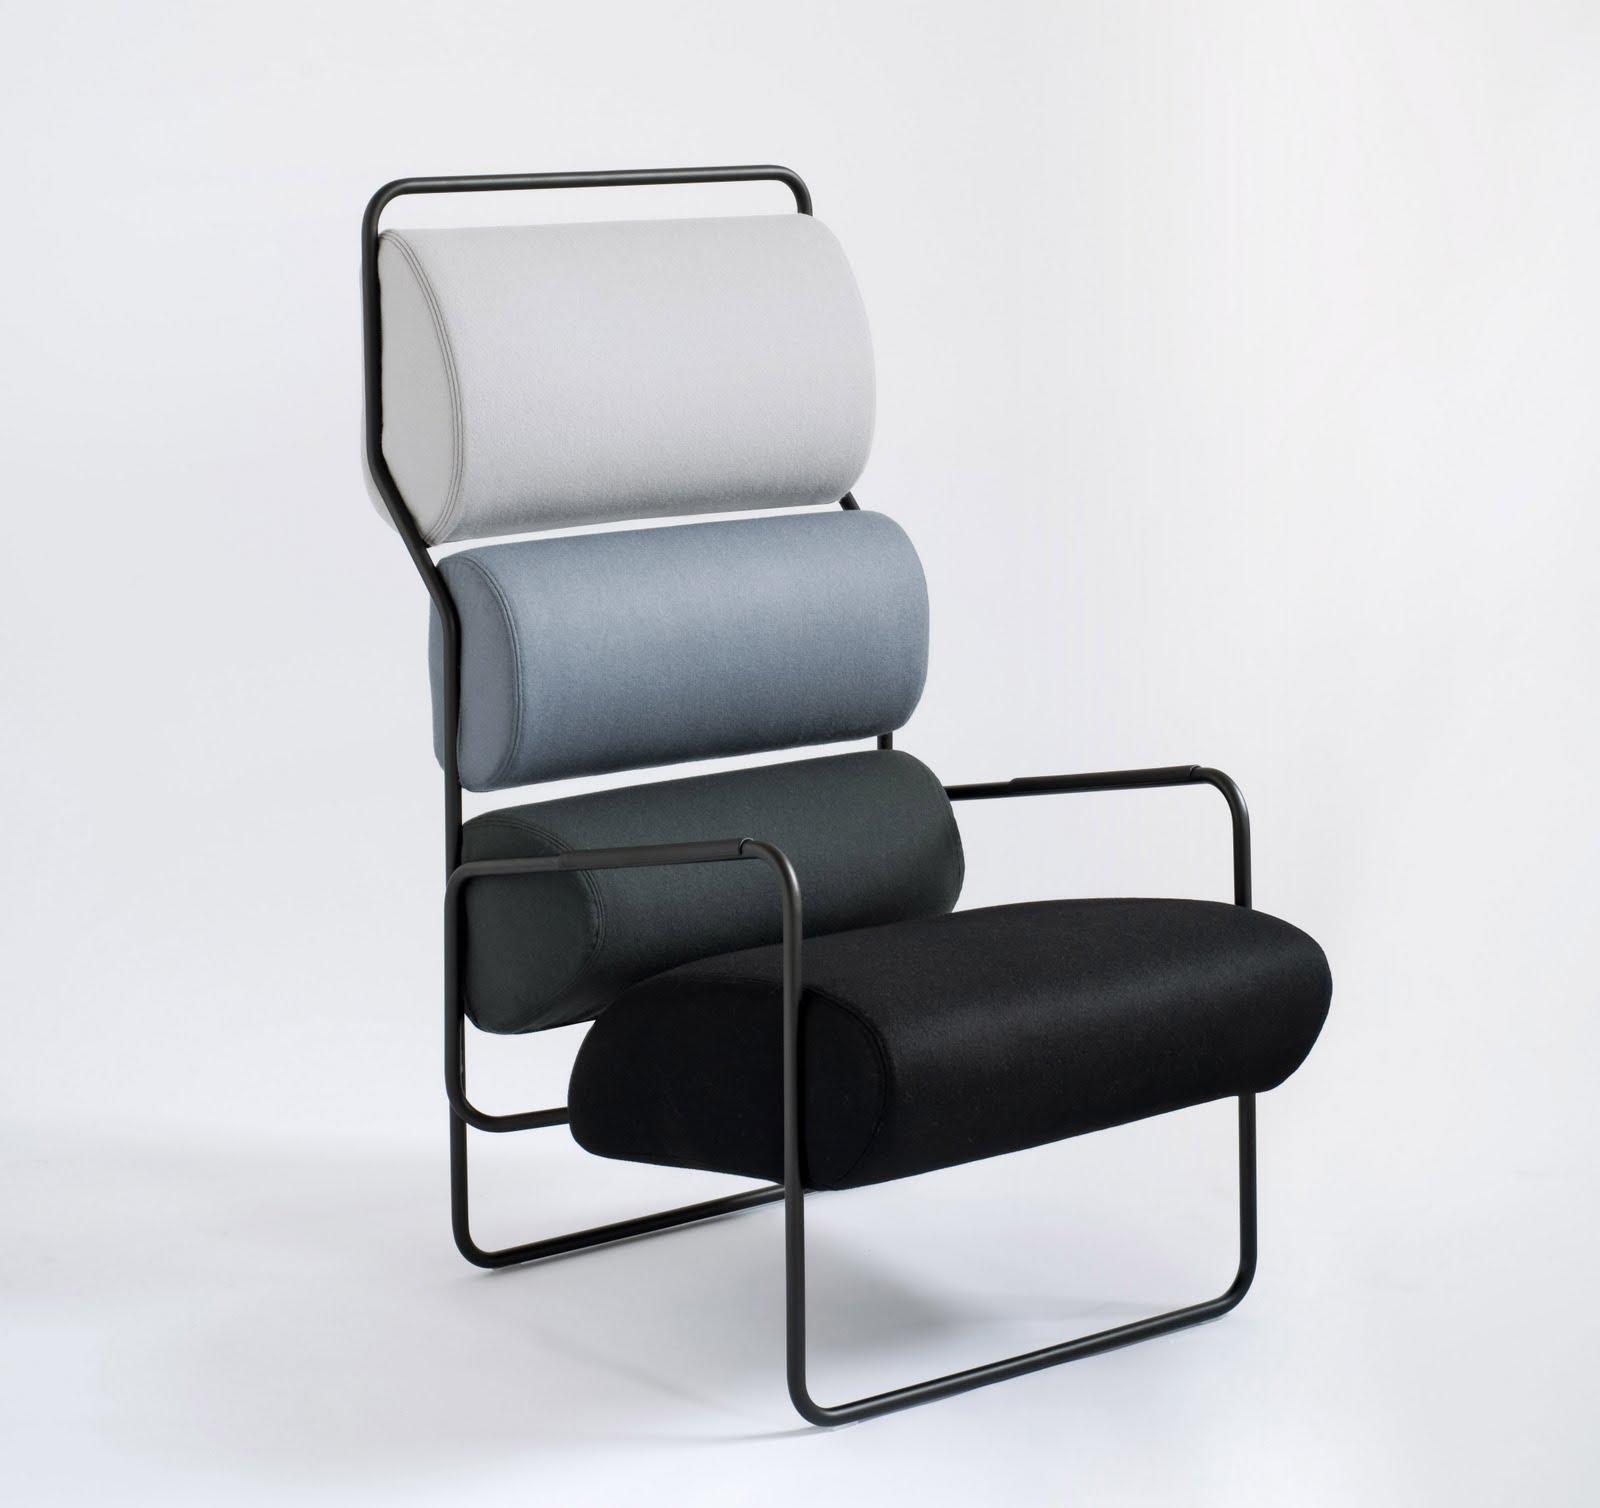 salon maison objet paris tacchini design scene. Black Bedroom Furniture Sets. Home Design Ideas